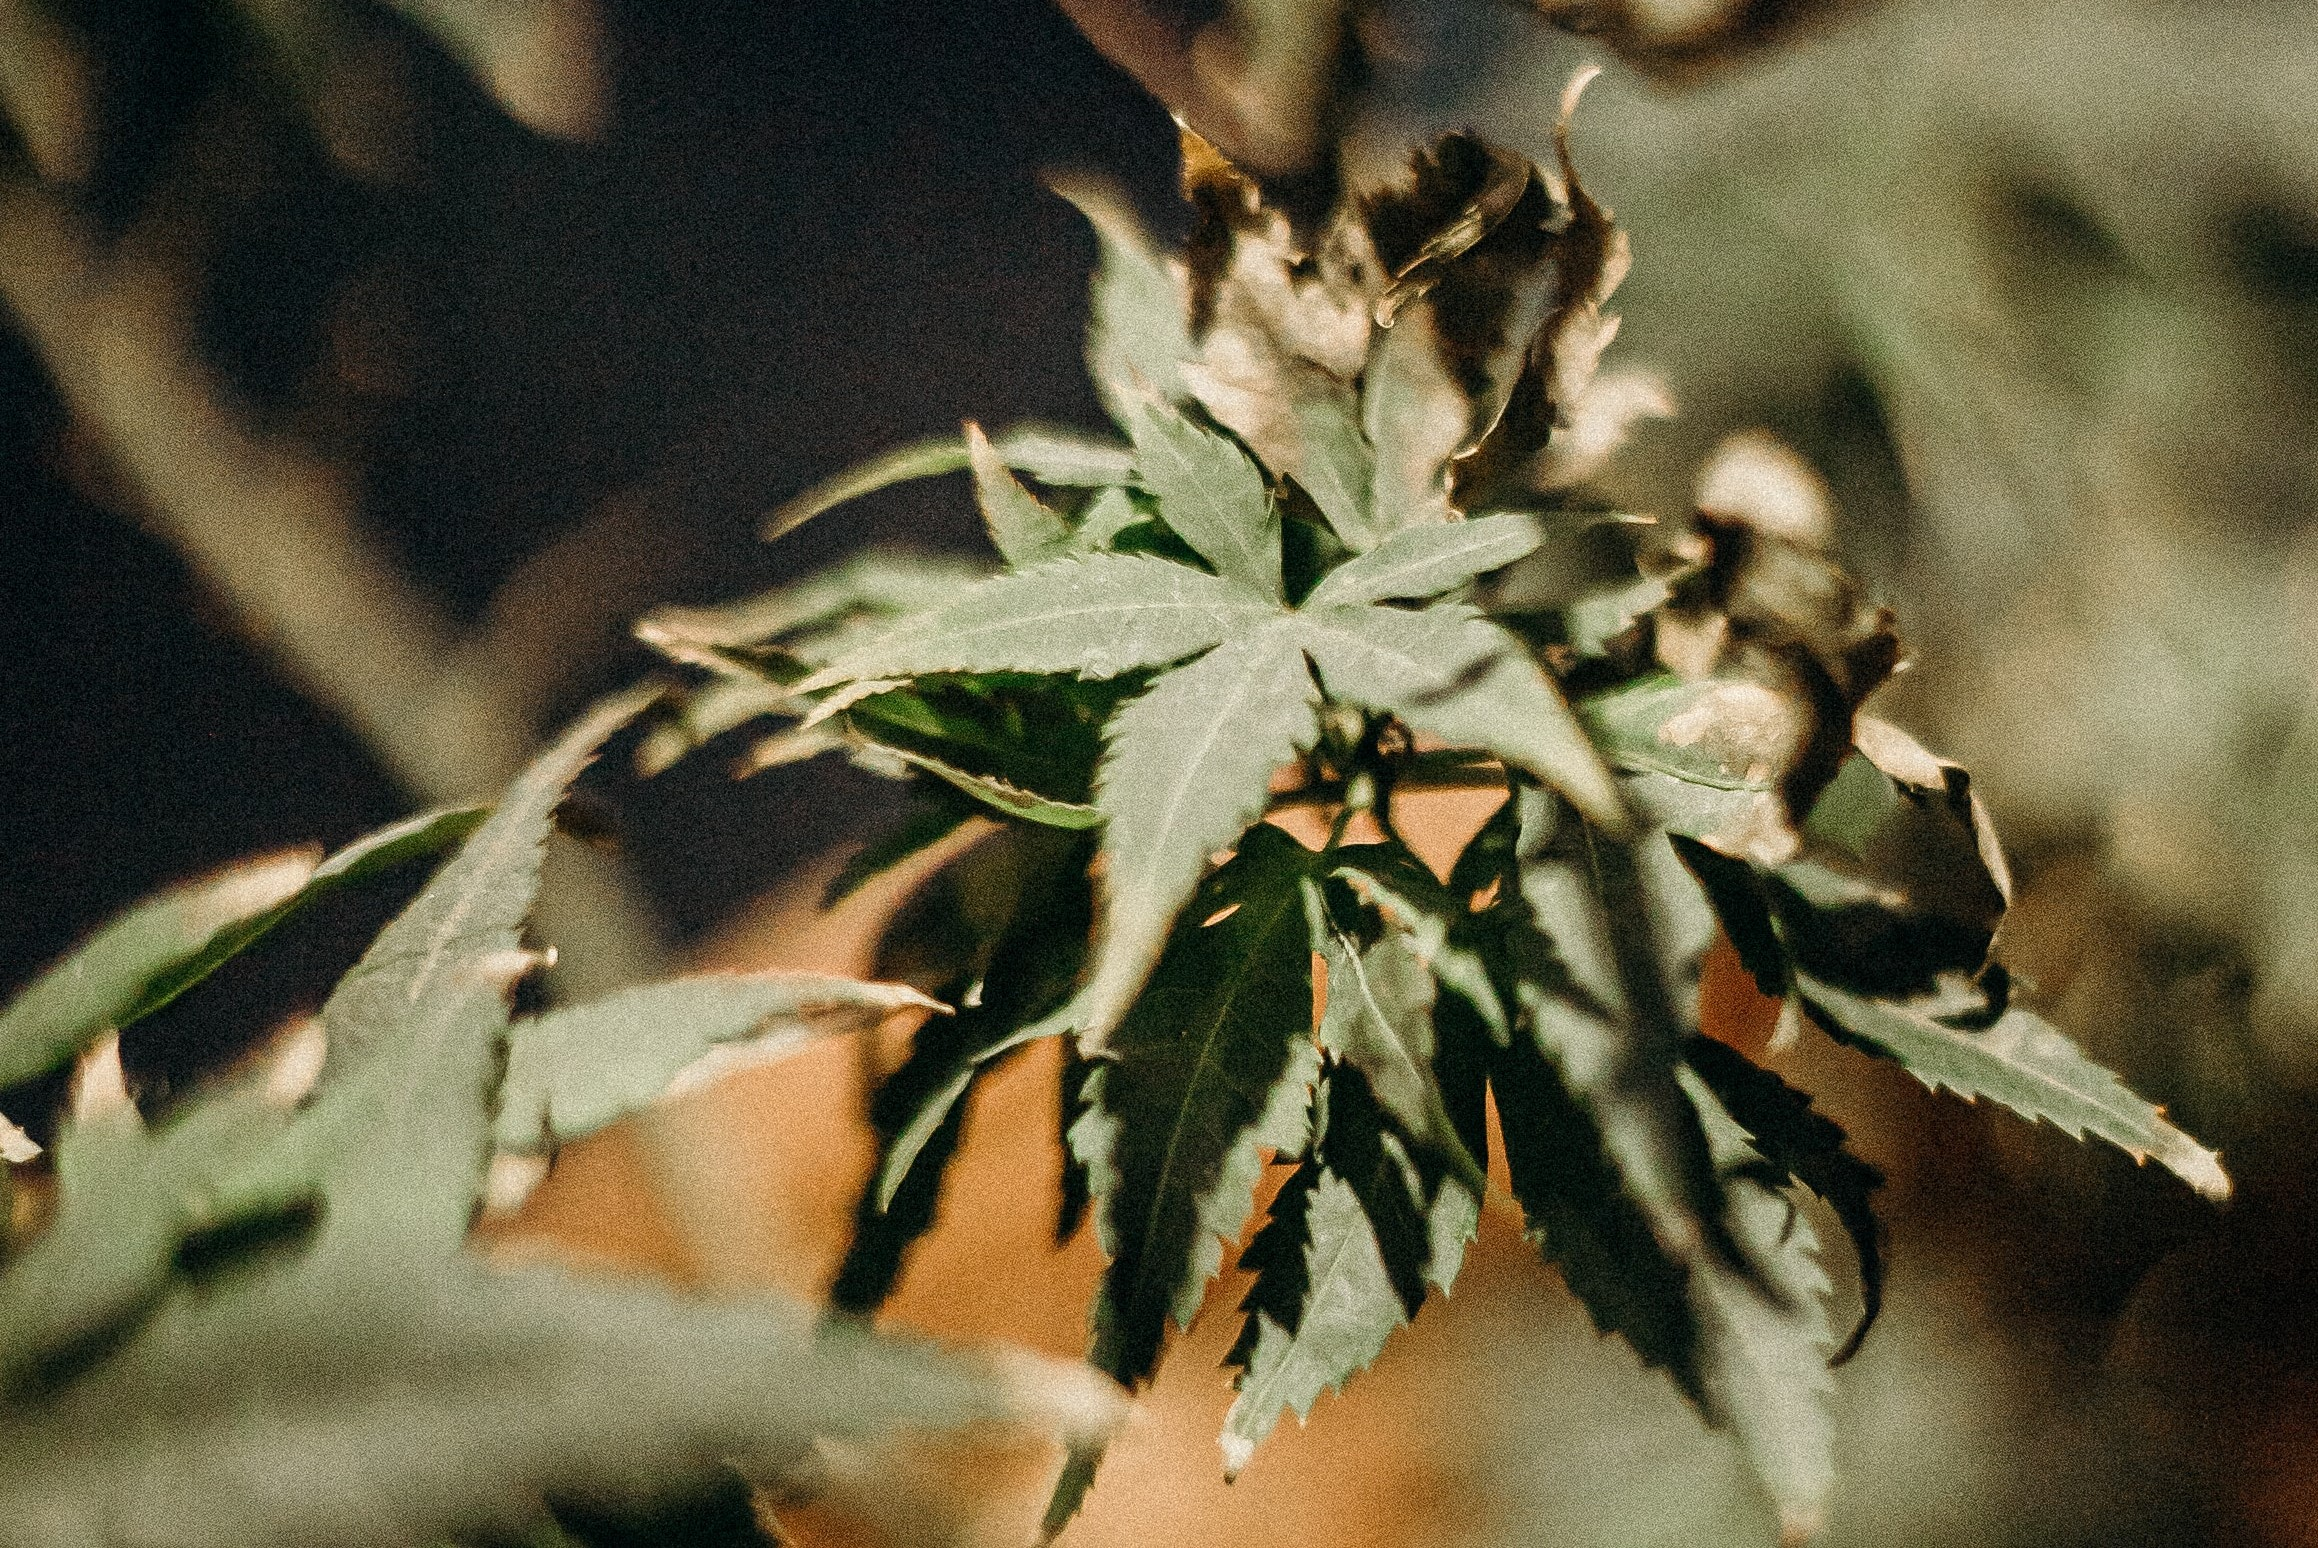 dry looking cannabis leaves